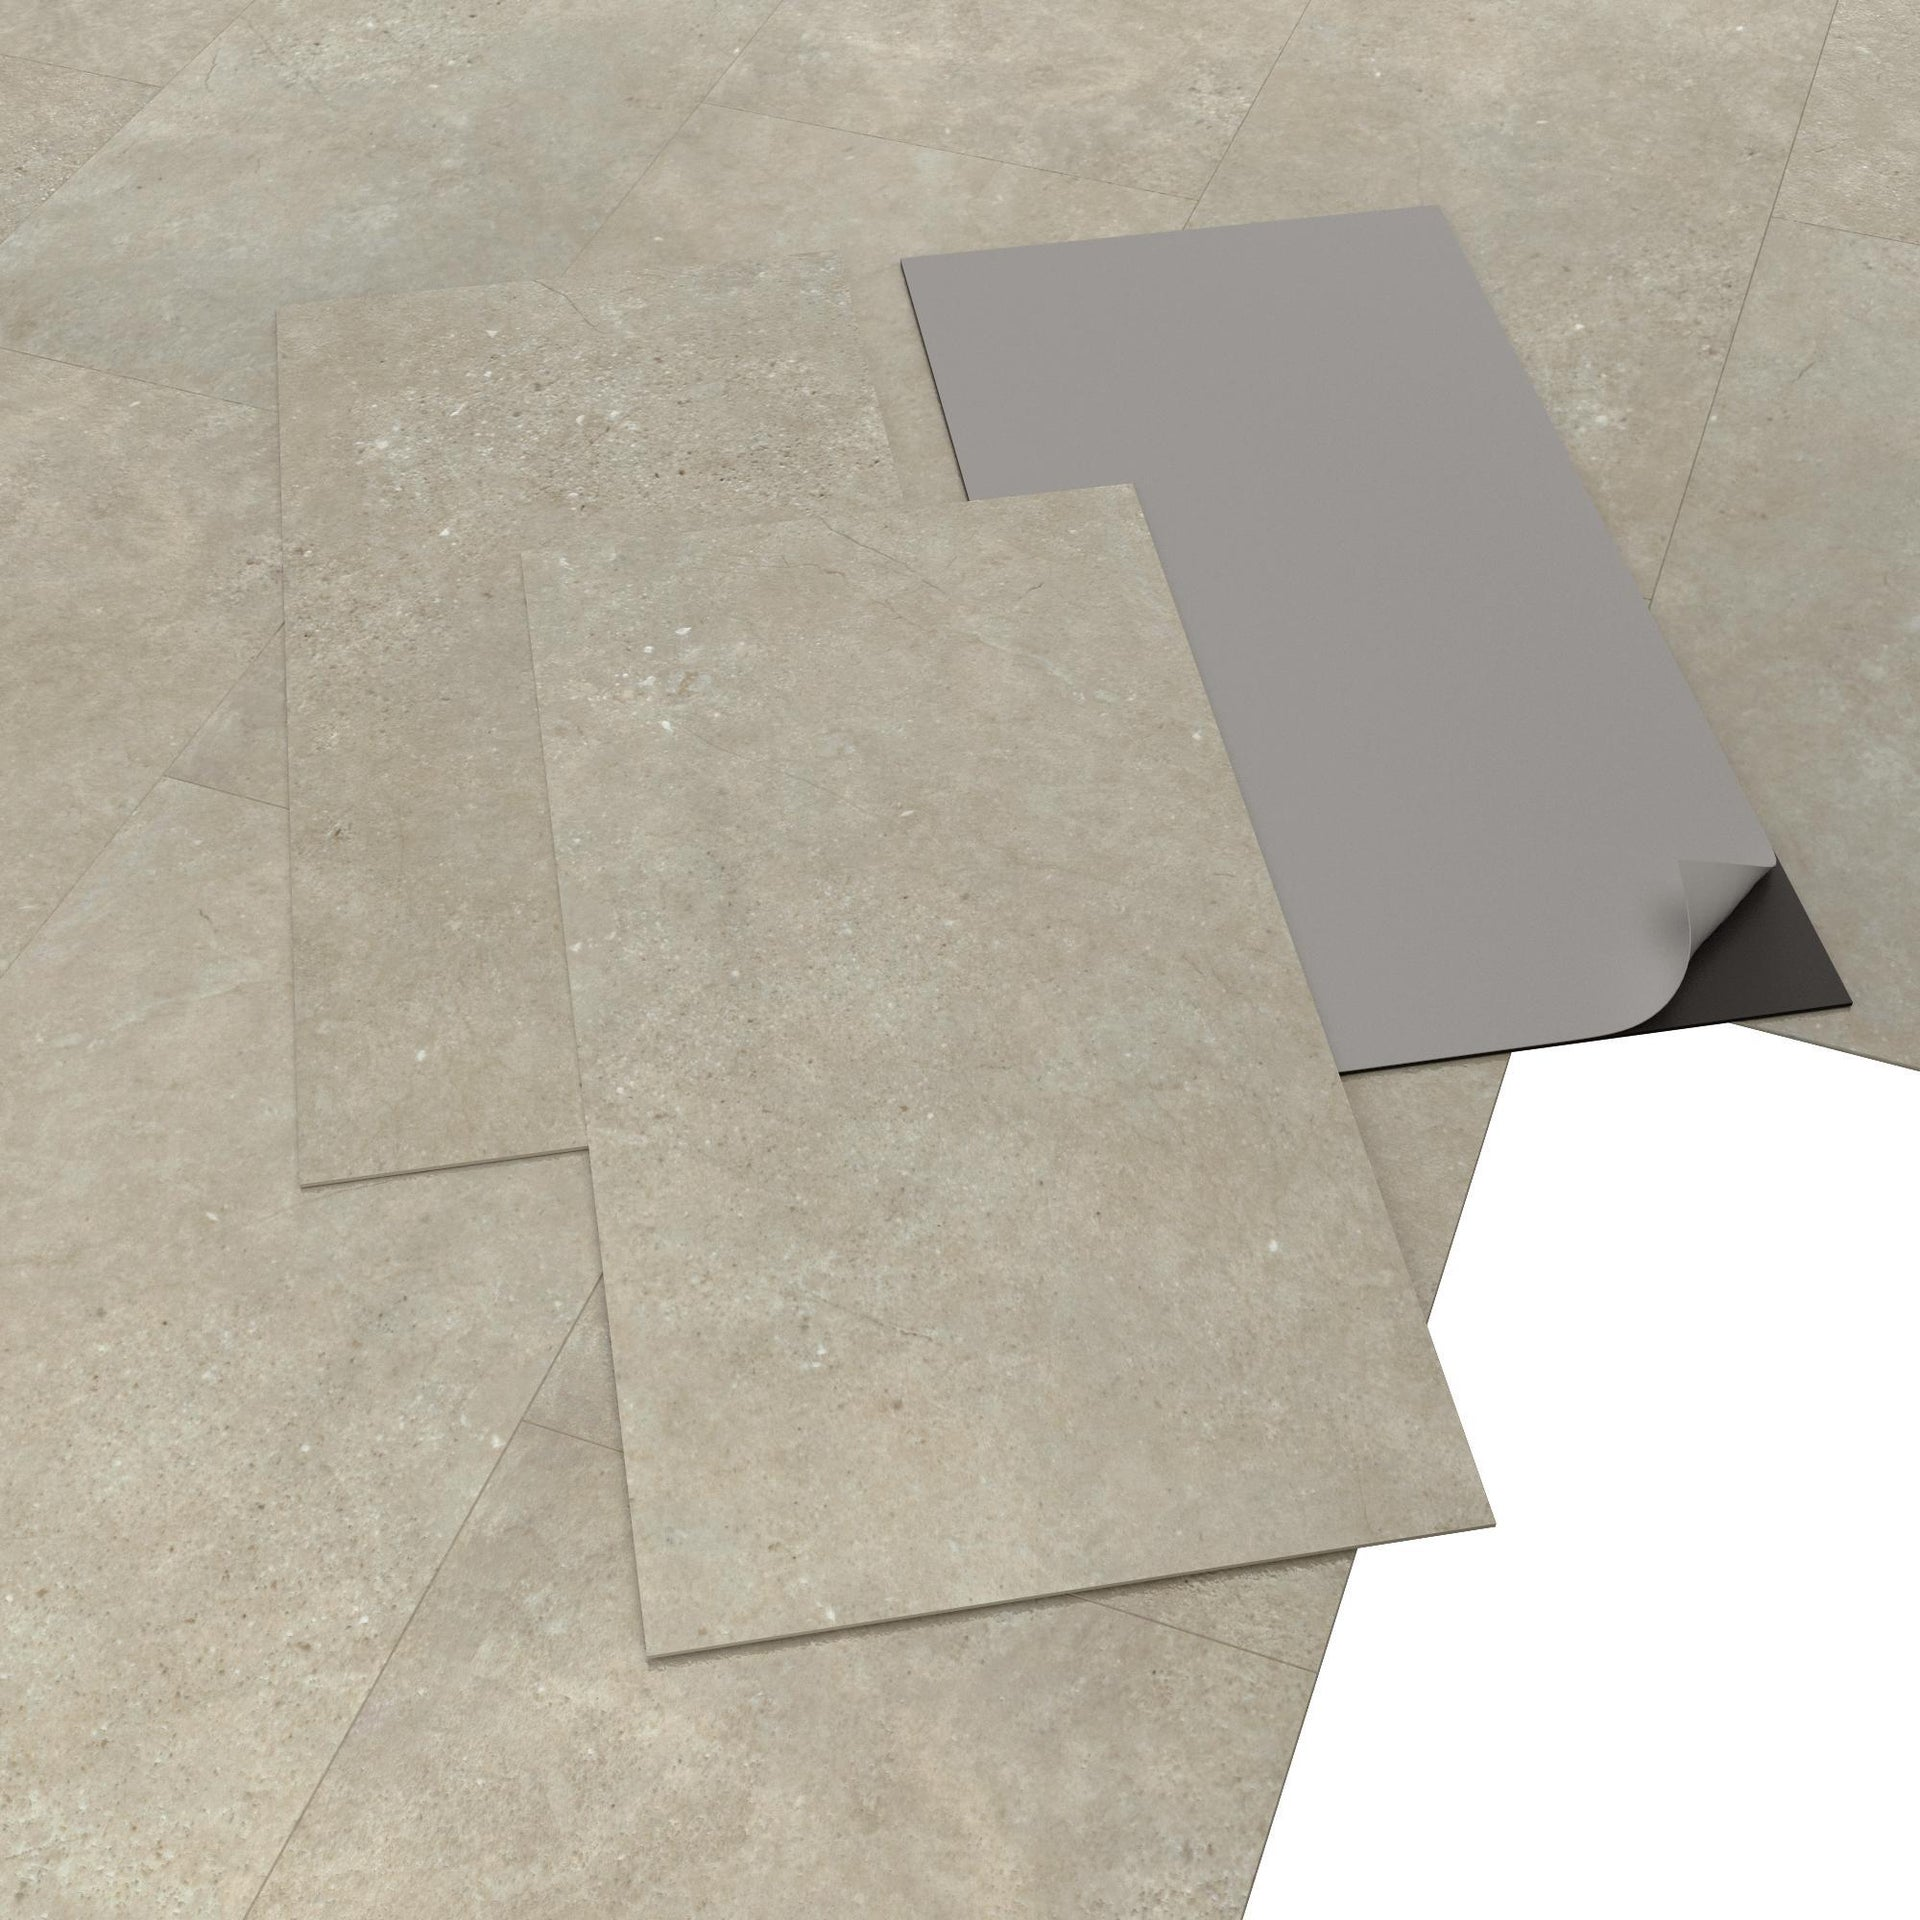 Pavimento PVC adesivo Limestone Sp 2 mm grigio / argento - 8